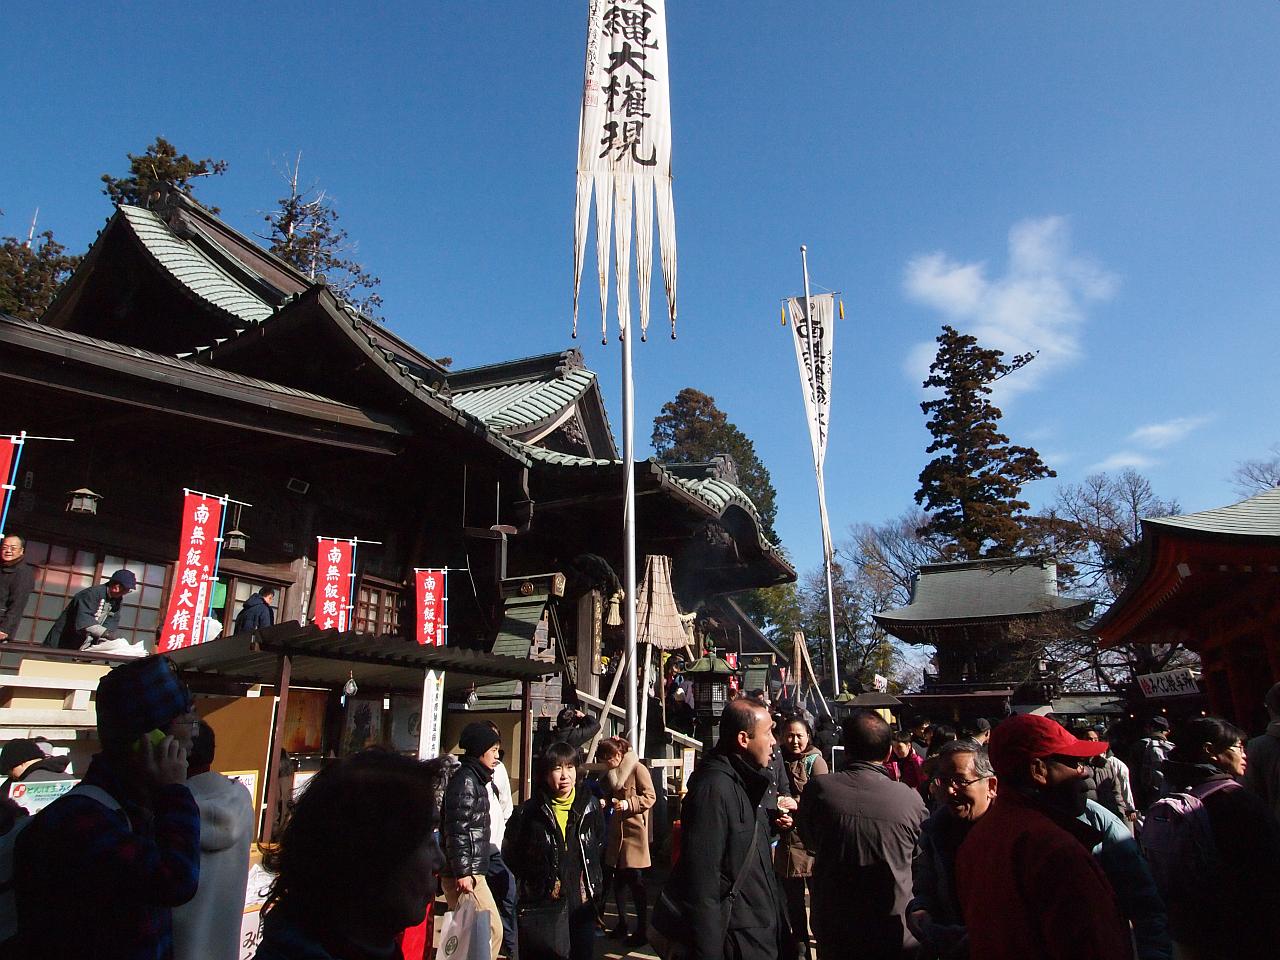 f:id:yasuo_ssi:20210920105416p:plain